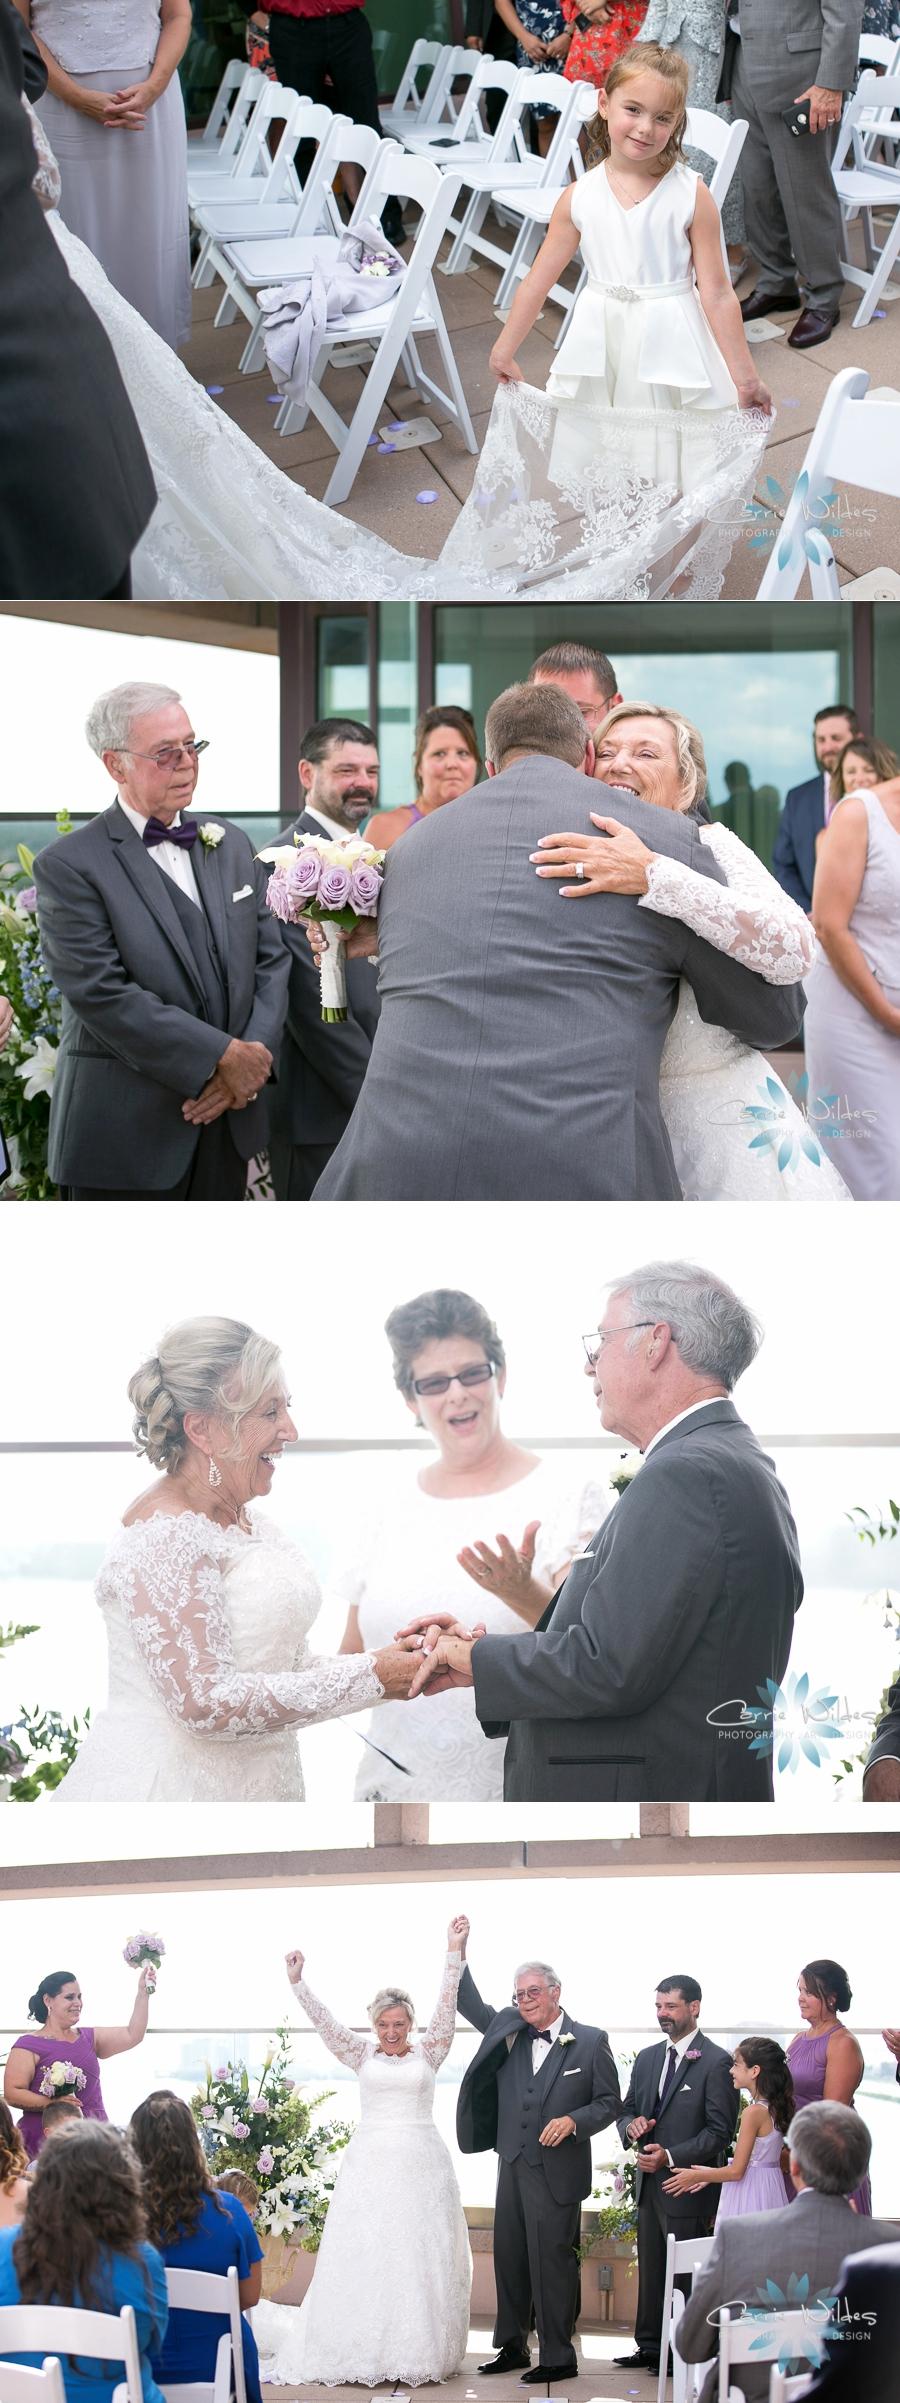 8_5_18 Donna and Bob Grand Hyatt Armani's Wedding_0008.jpg